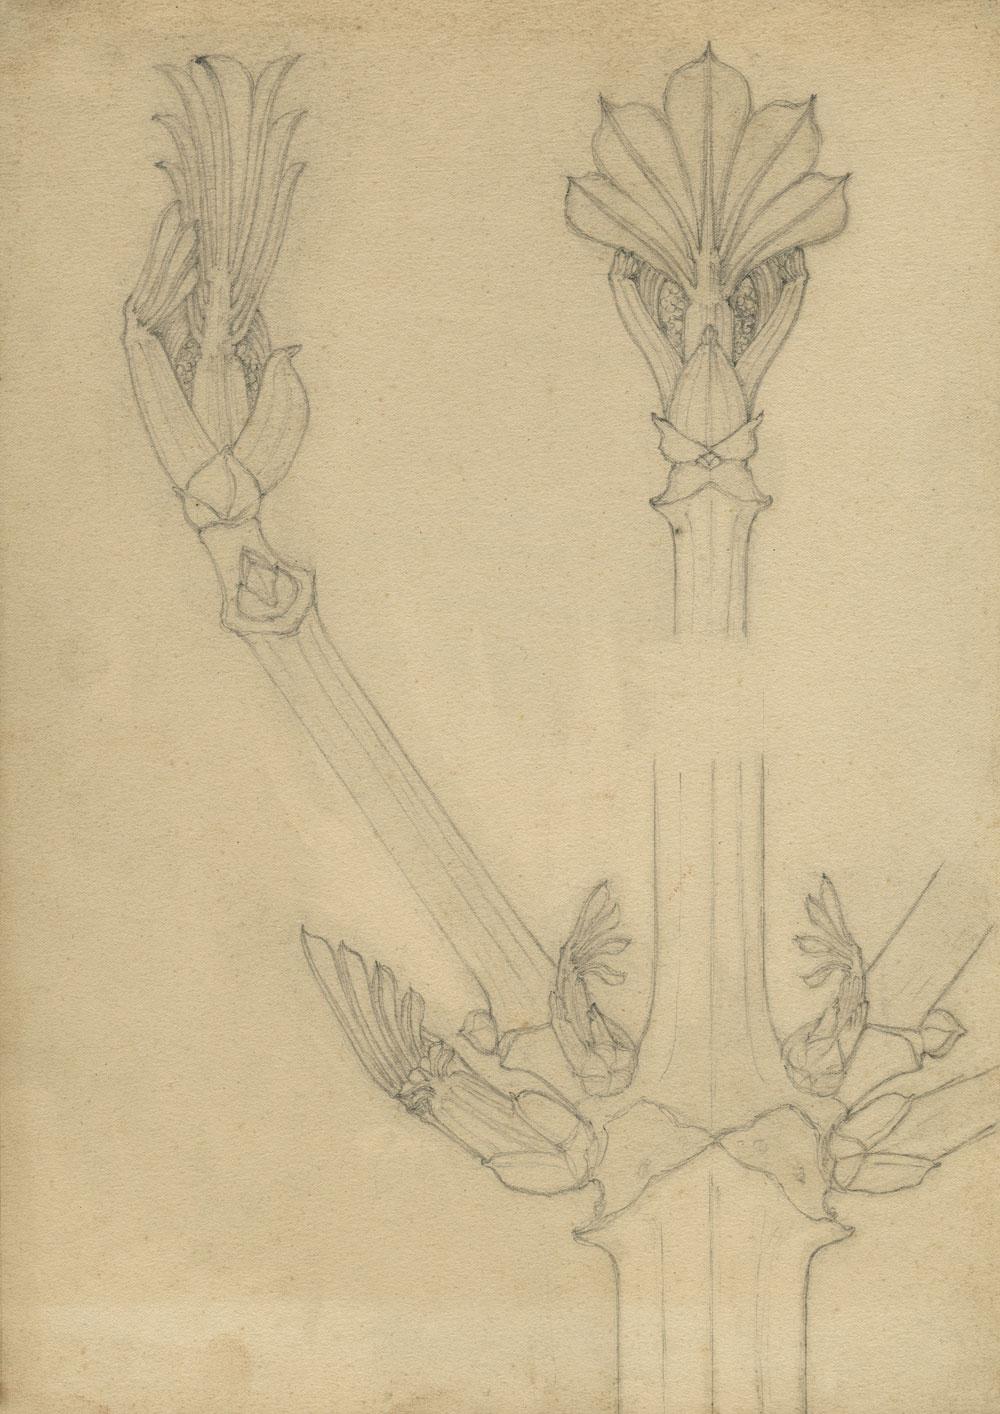 Karl Blossfeldt: Növénytanulmány, (gesztenye), 1890-es évek<br />Stiftung Ann und Jürgen Wilde, Pinakothek der Moderne, München